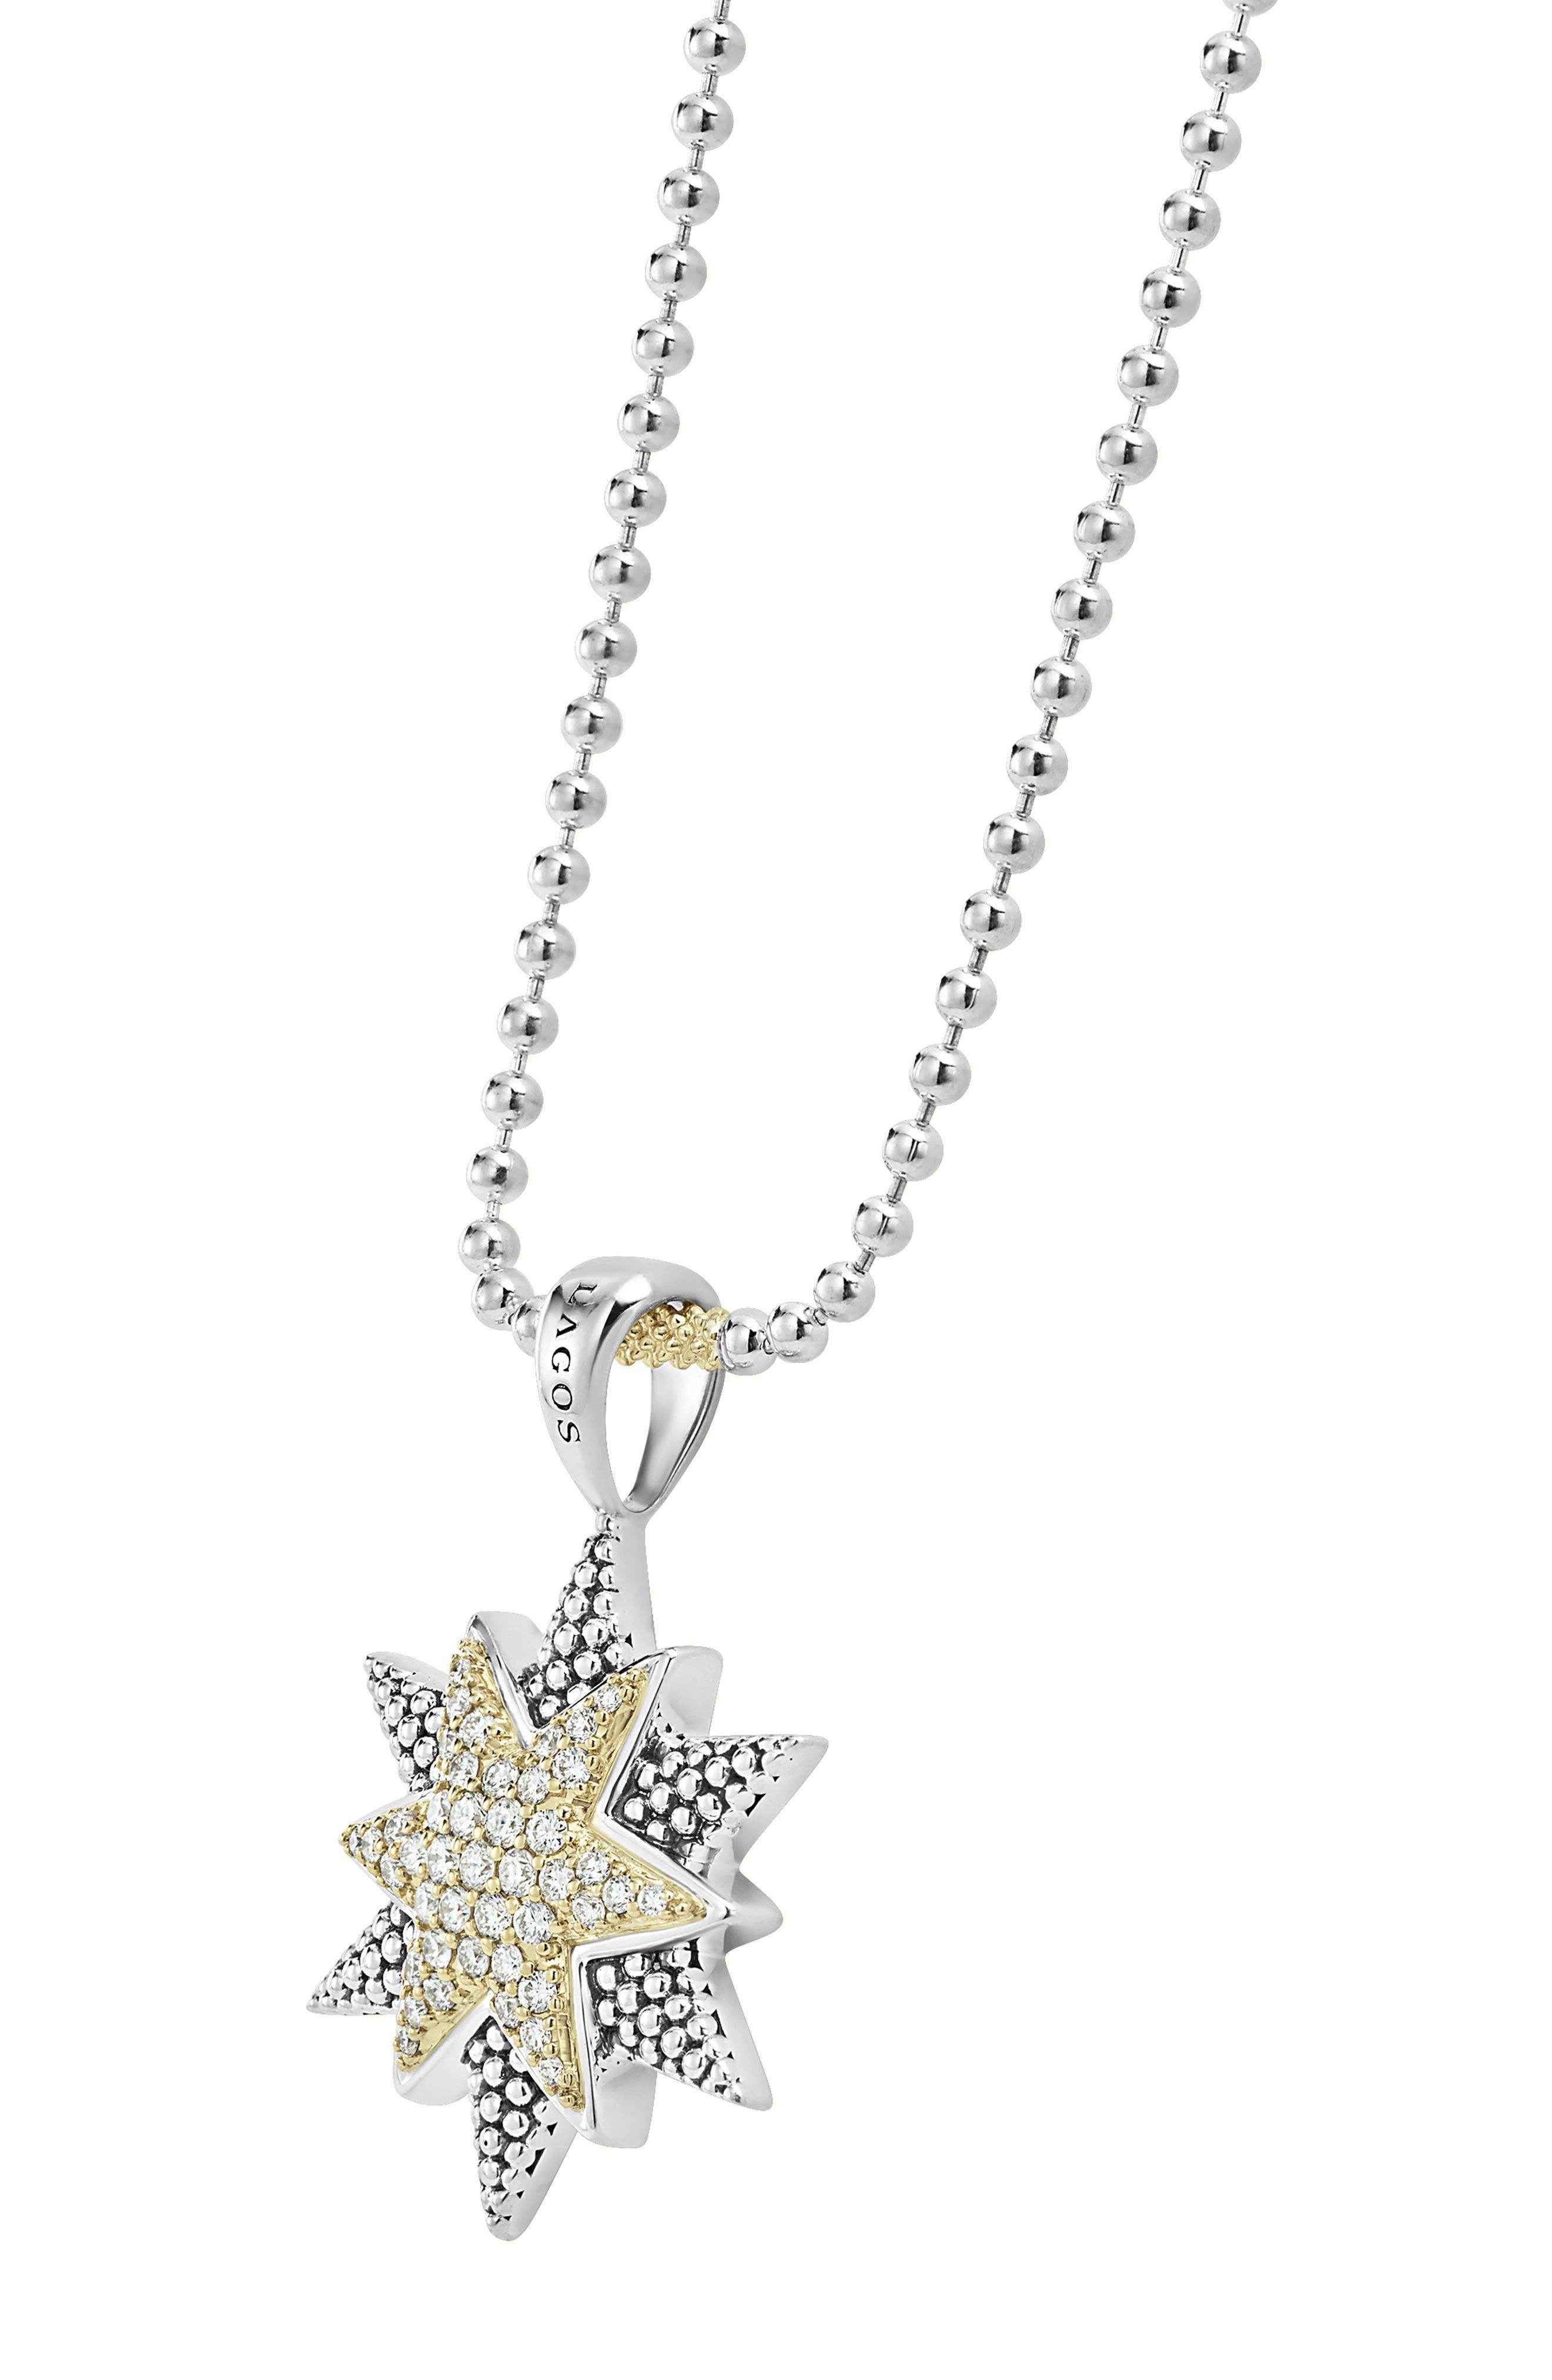 North Star Large Diamond Pendant Necklace,                             Alternate thumbnail 3, color,                             Diamond